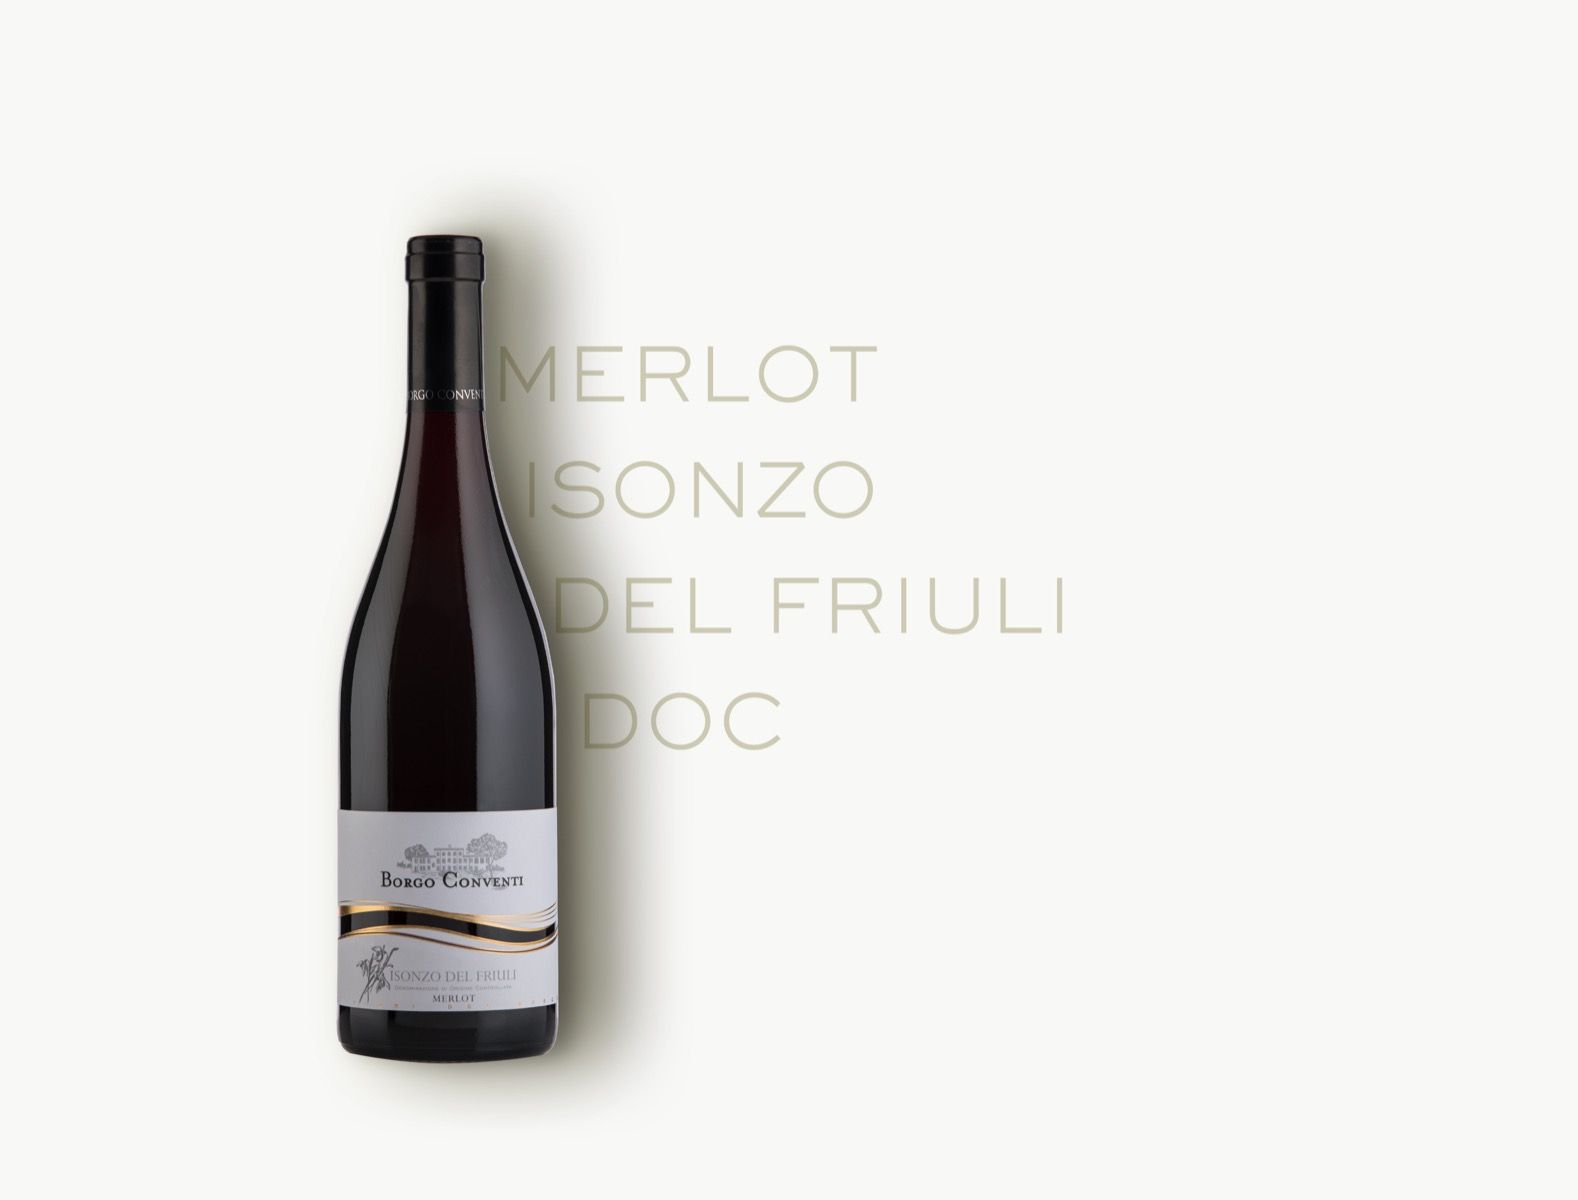 Merlot Isonzo del Friuli DOC